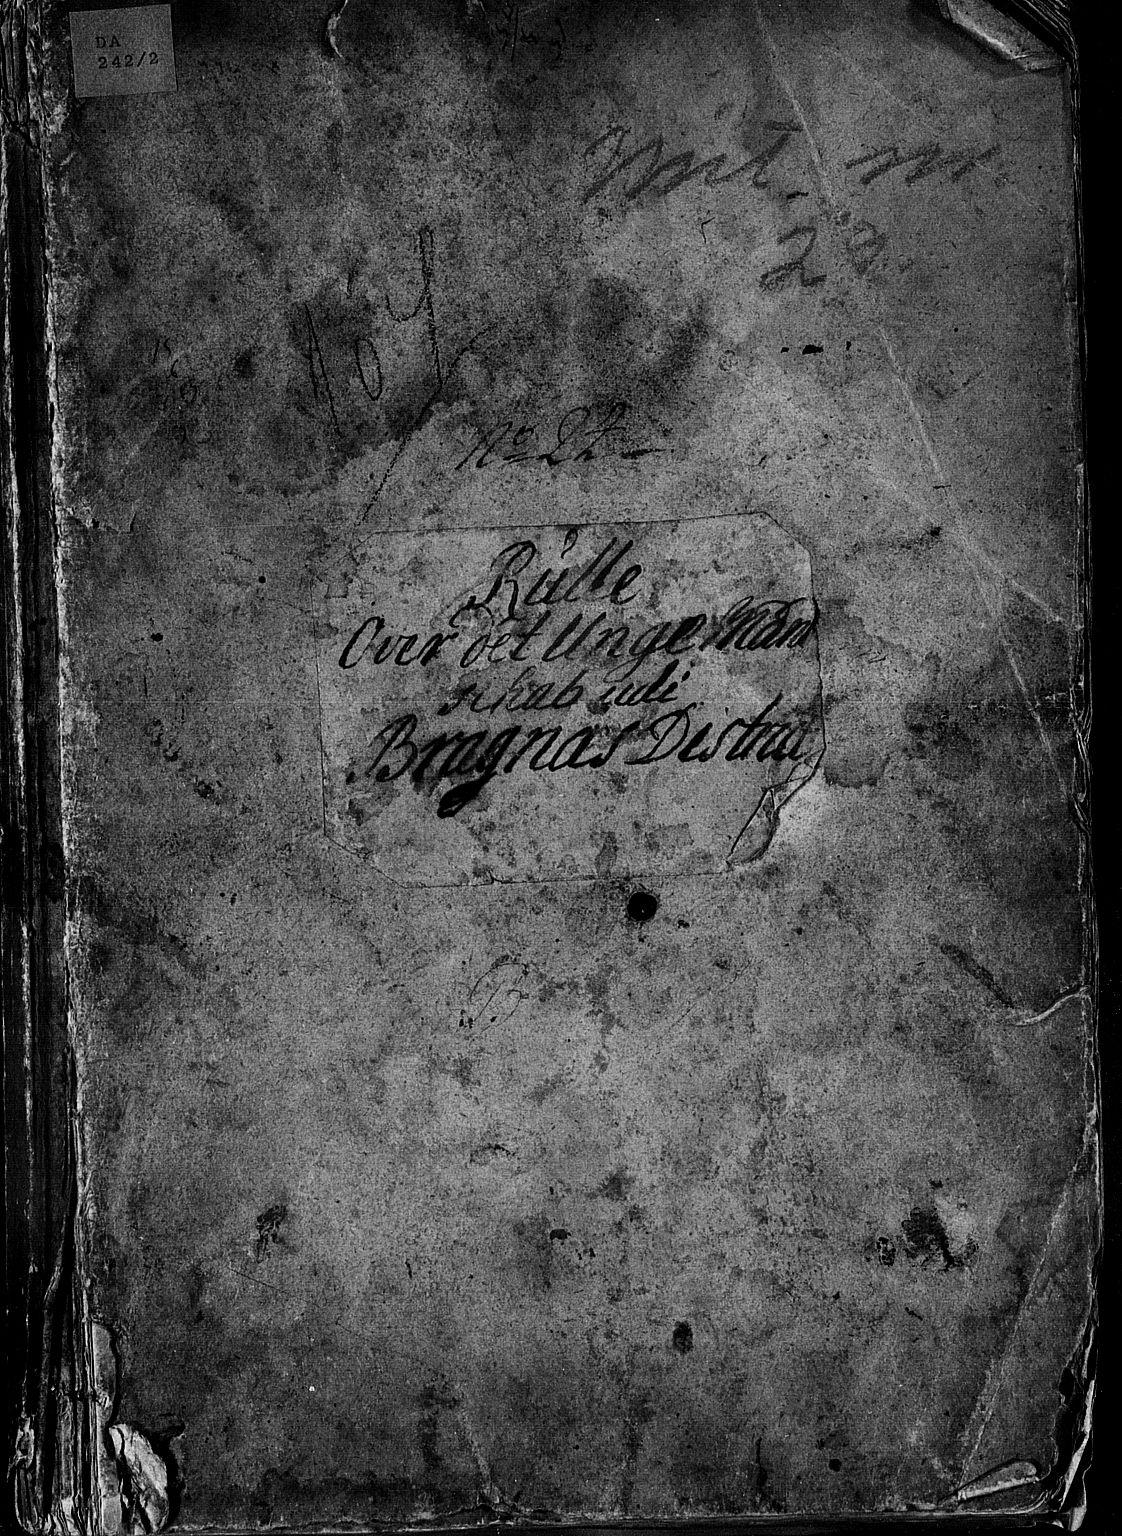 SAKO, Drammen innrulleringsdistrikt, F/Fa/L0005: Ungdomsrulle, 1723-1727, s. 2